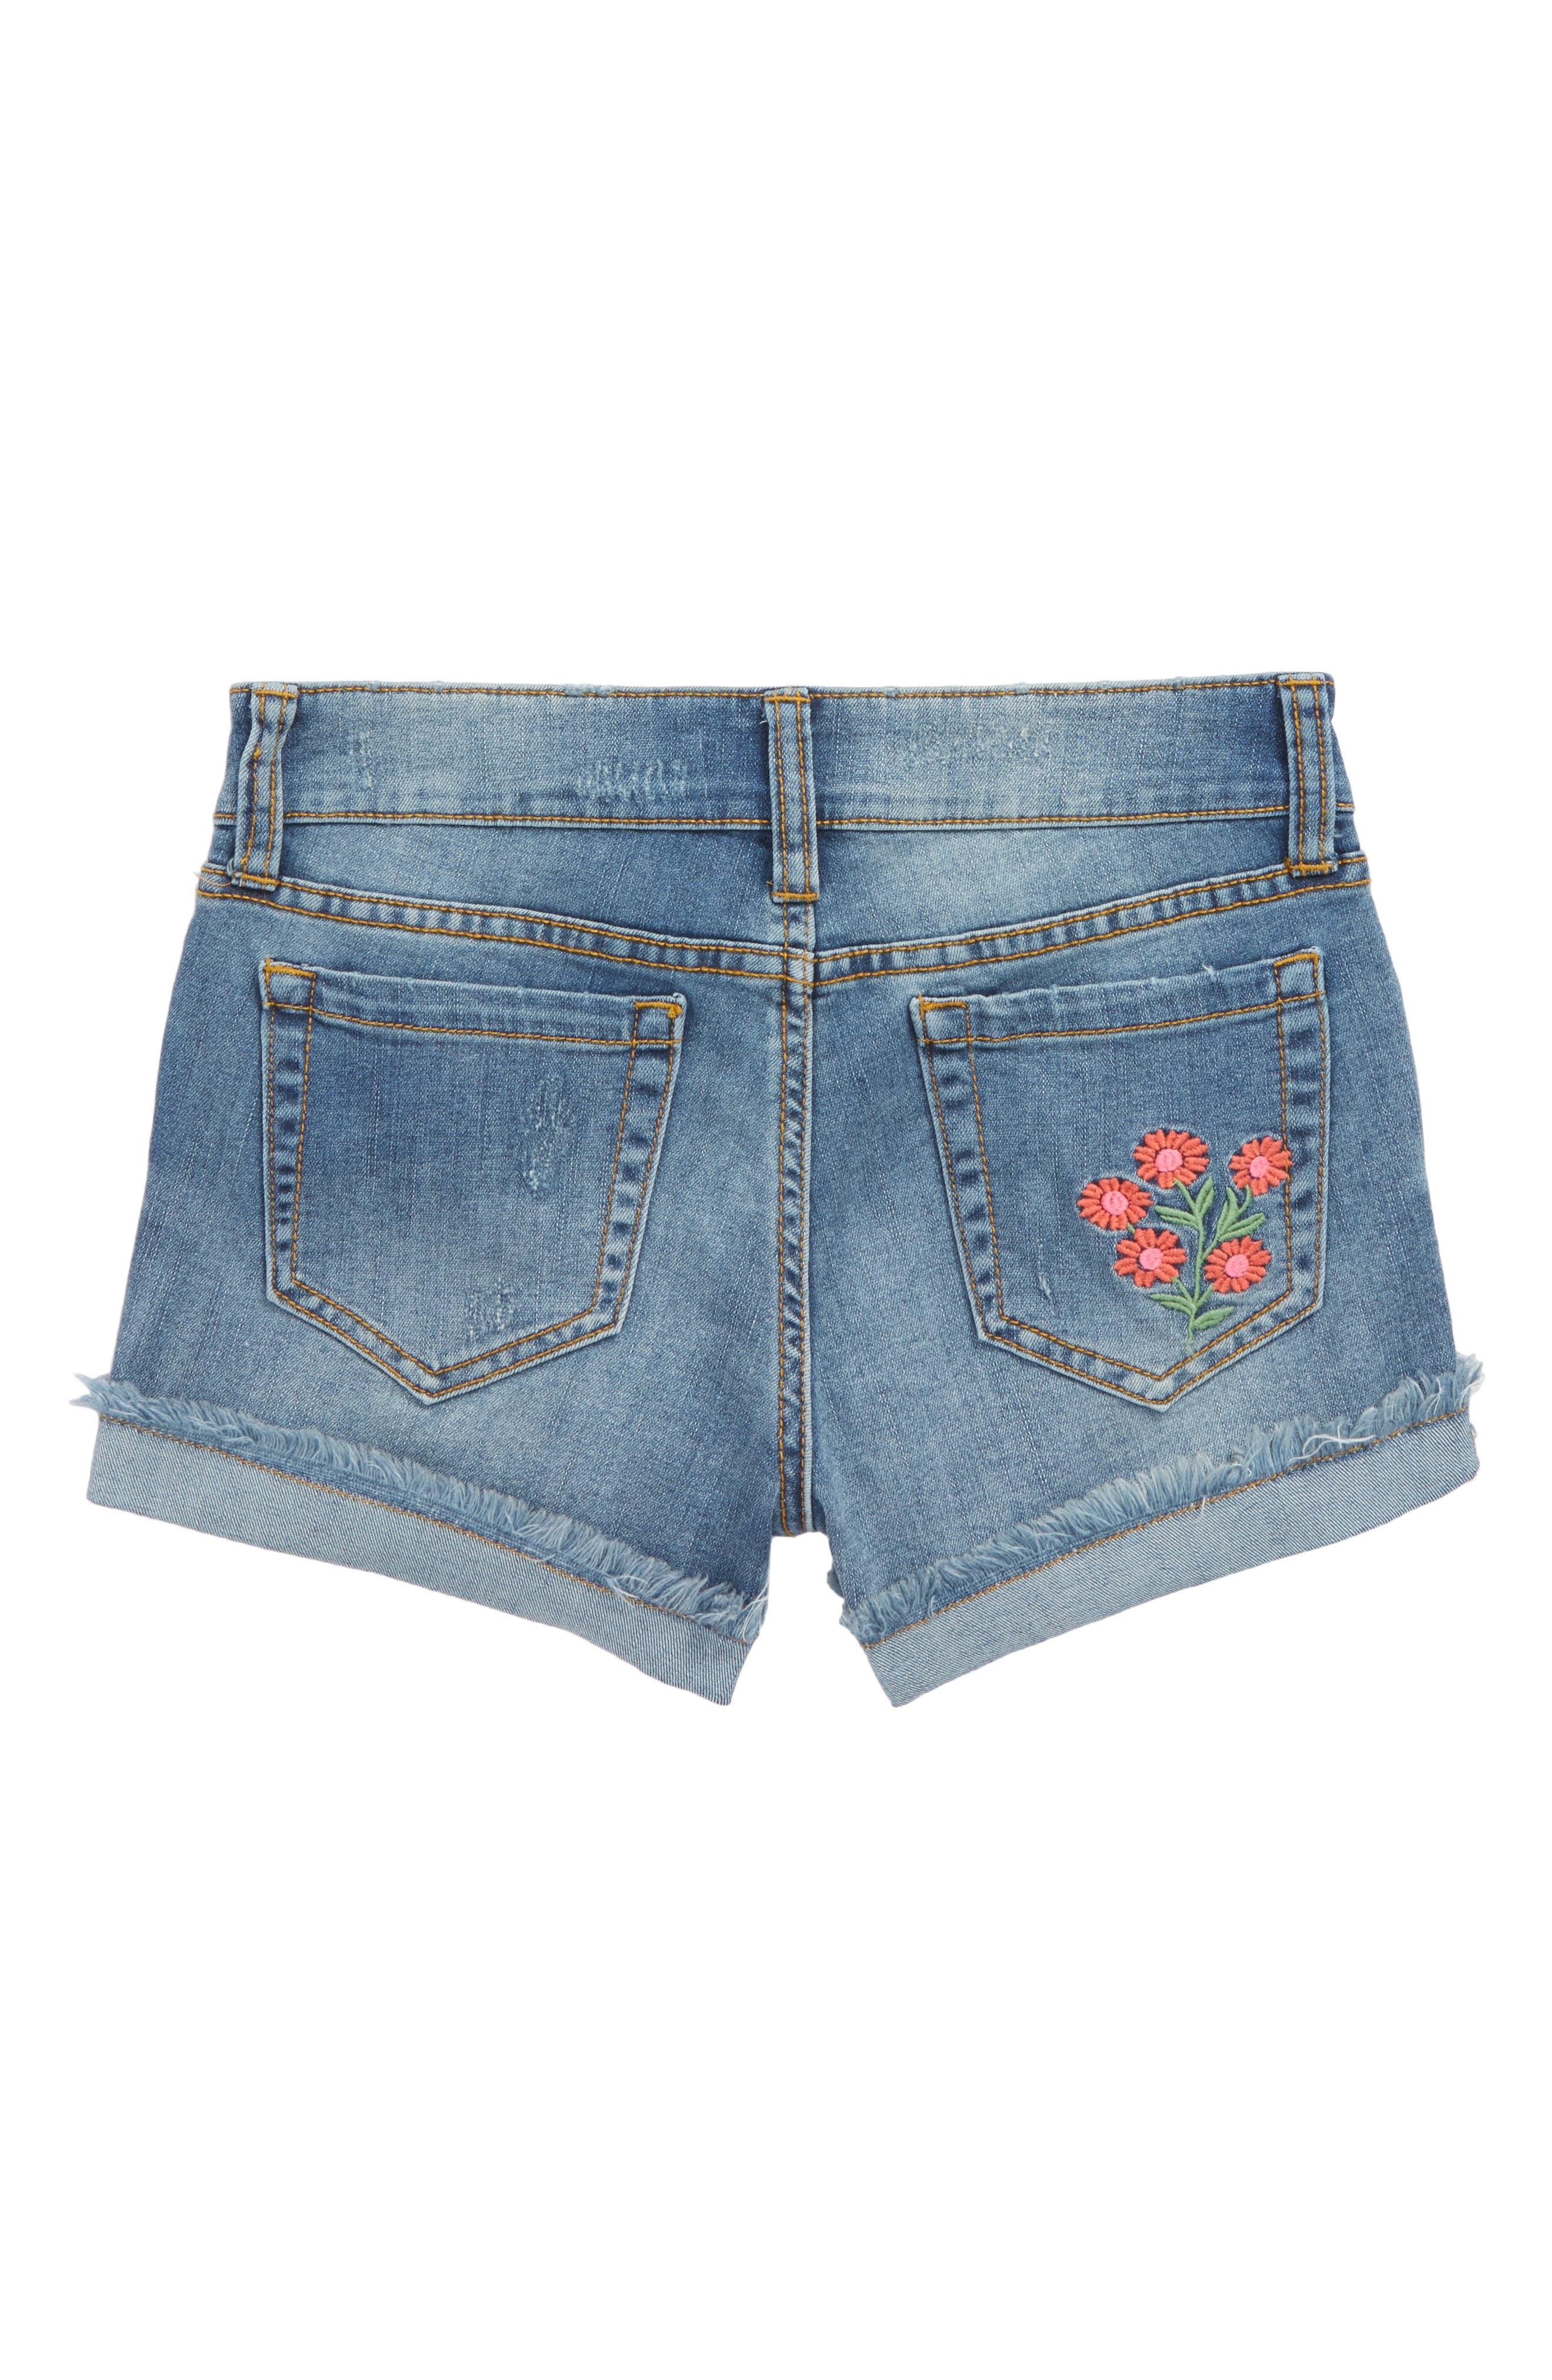 Flower Embroidered Denim Shorts,                             Alternate thumbnail 2, color,                             450